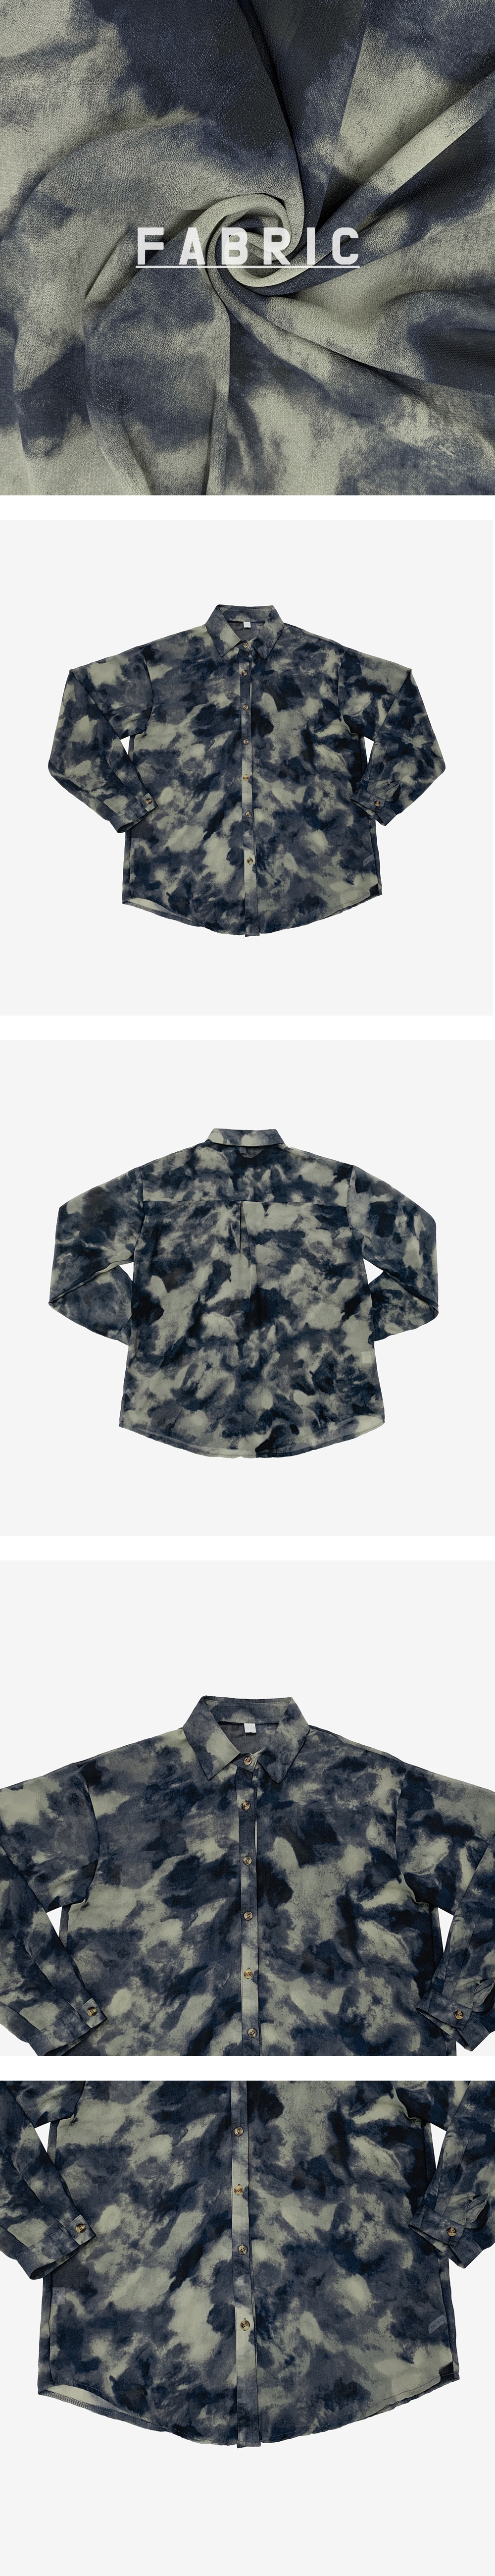 Jimmy tie-dye see-through shirt